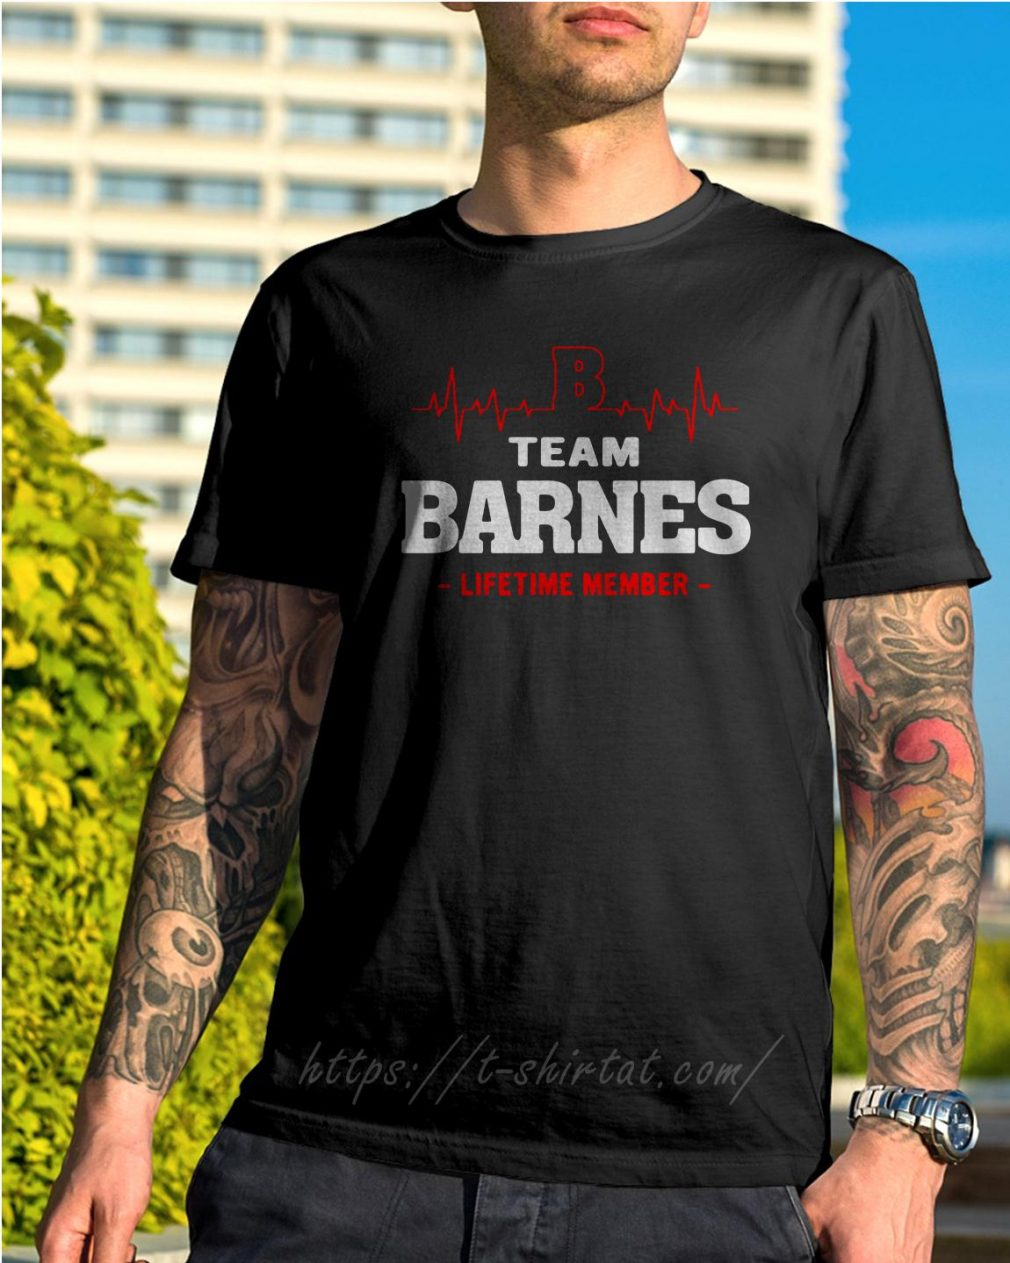 Heartbeat team Barnes lifetime member shirt